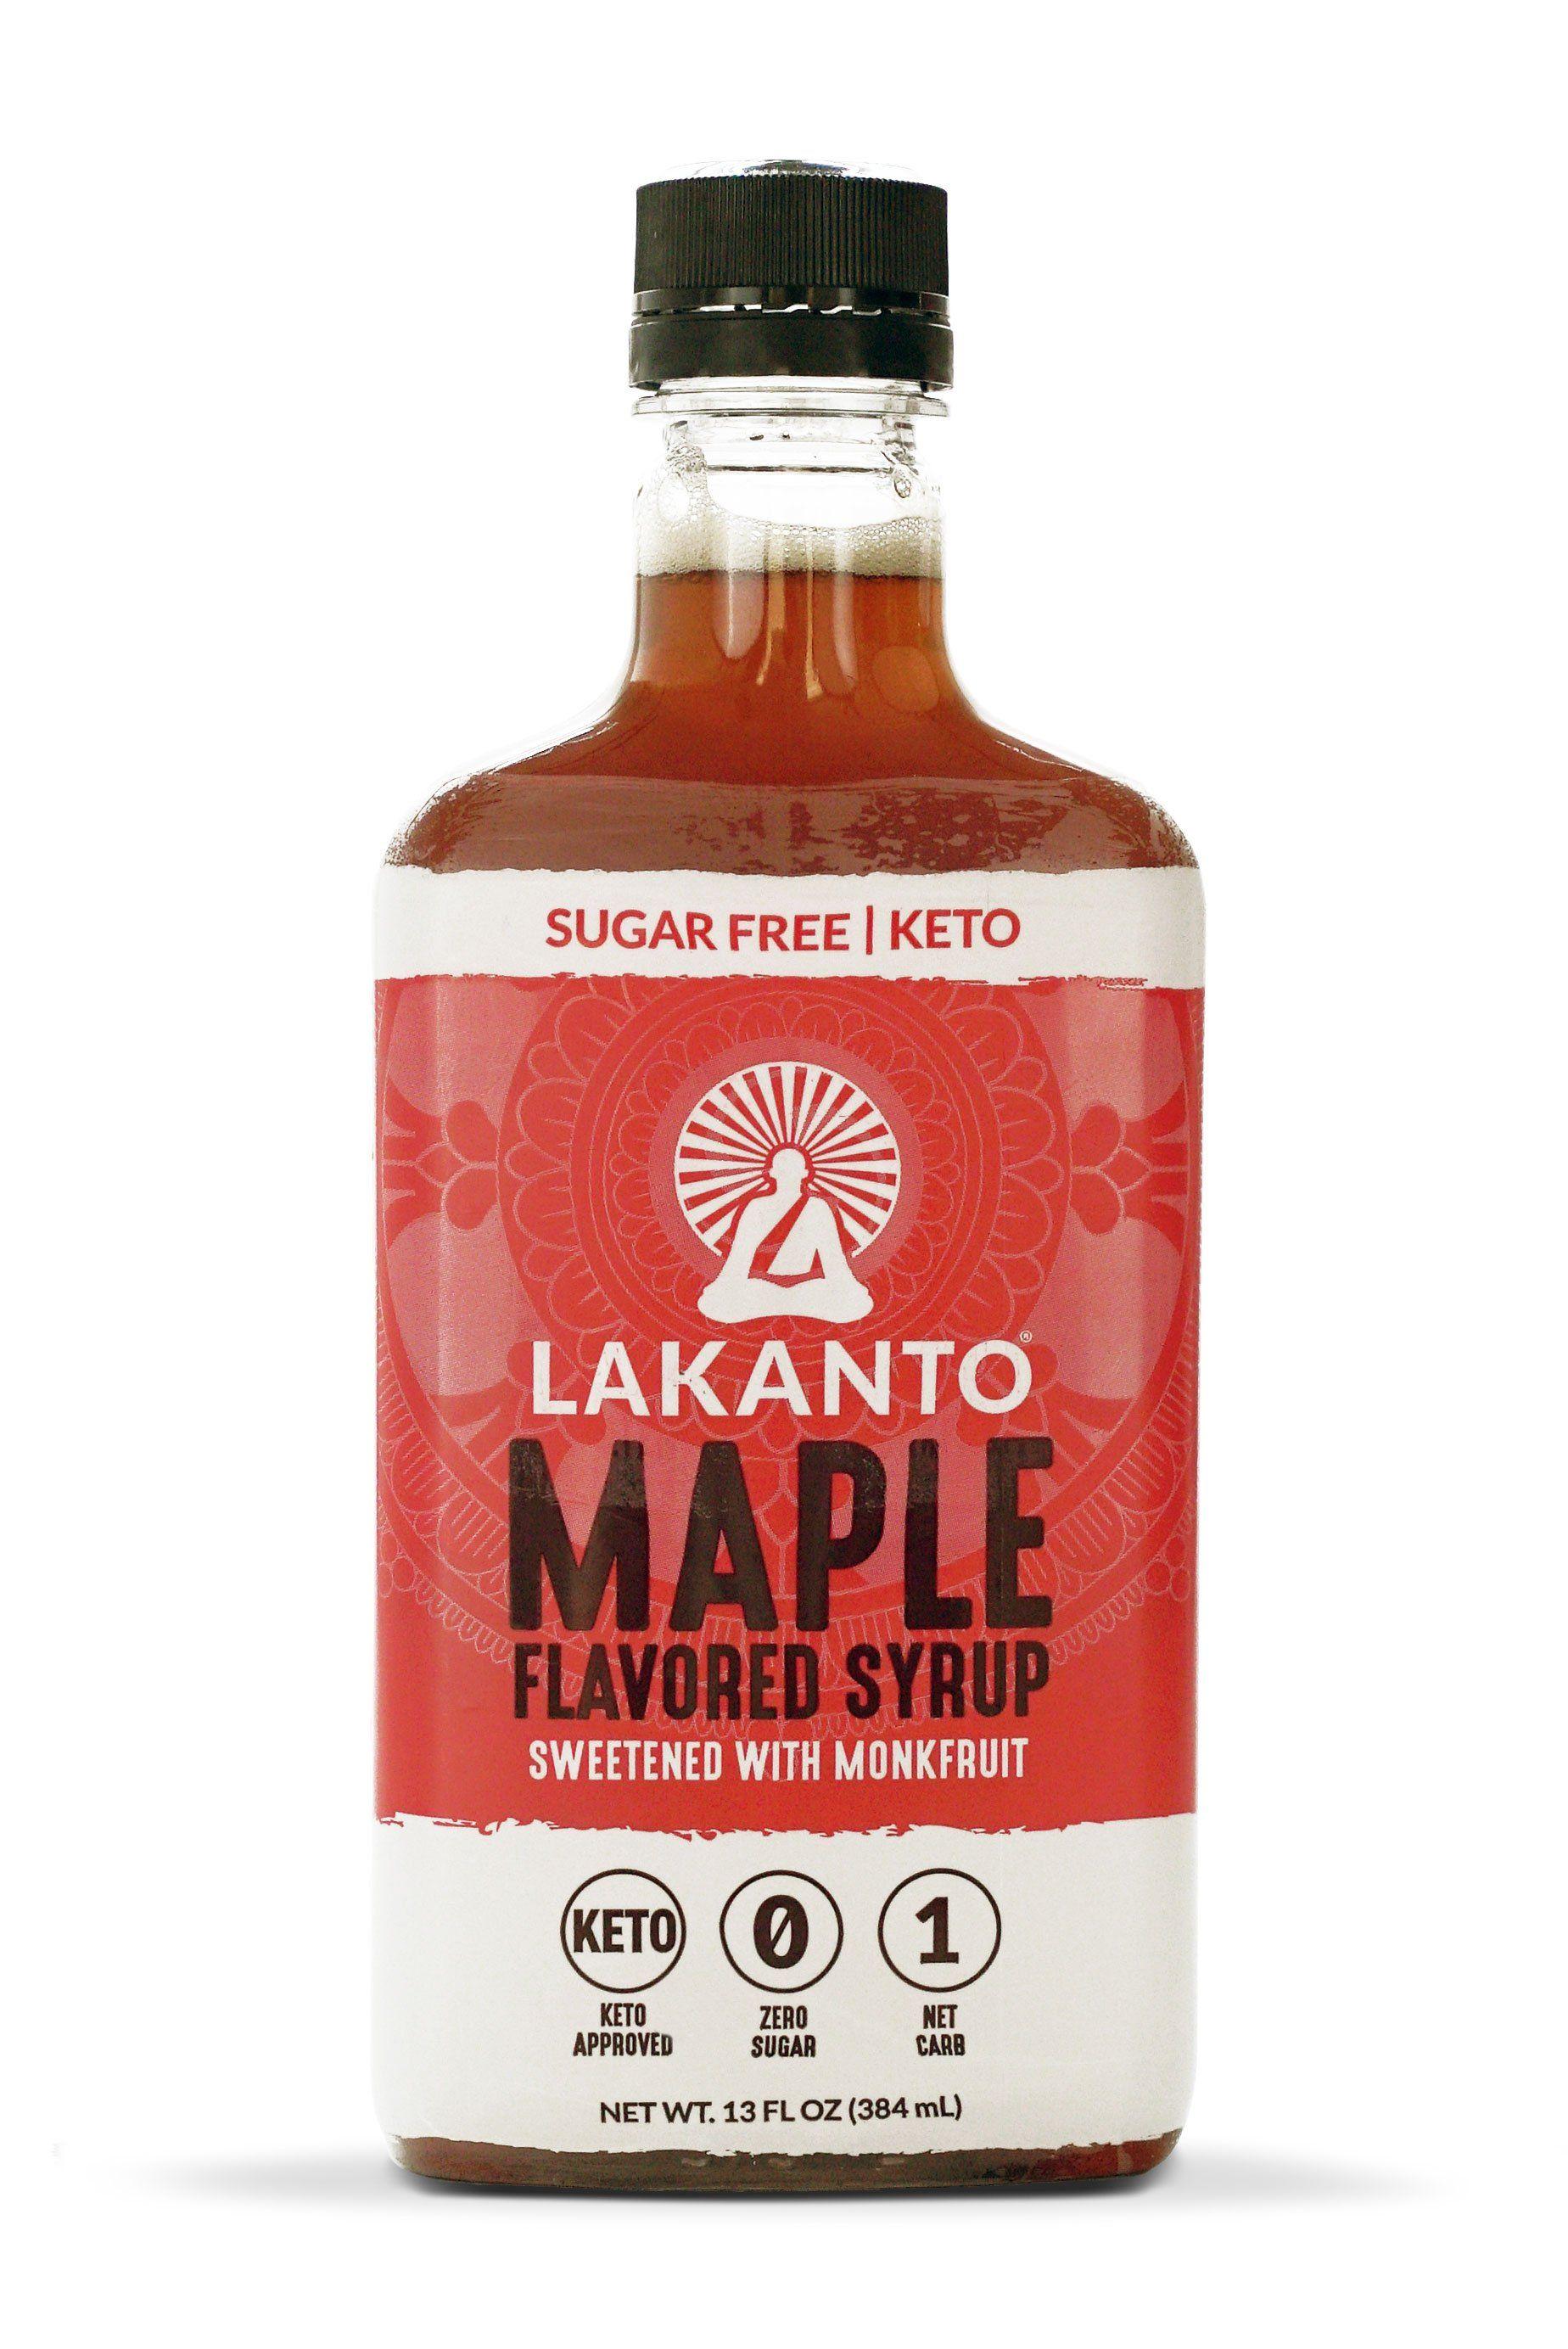 Thomas Delauer Lakanto Bundle Sugar Free Maple Syrup Sugar Free Lakanto